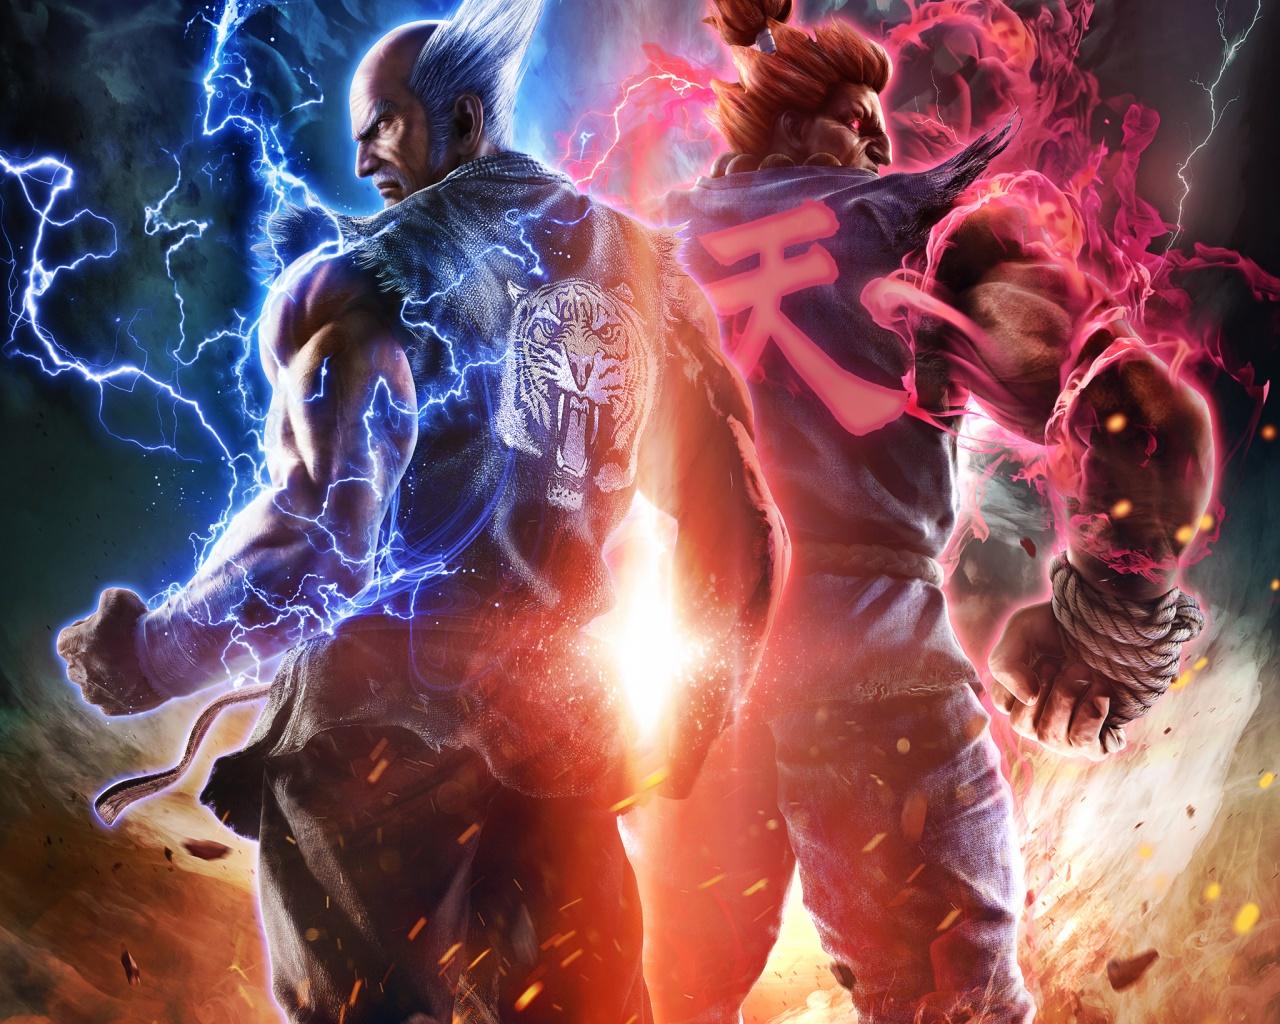 Akuma Tekken 7 Fated Retribution HD Wallpaper   iHD Wallpapers 1280x1024